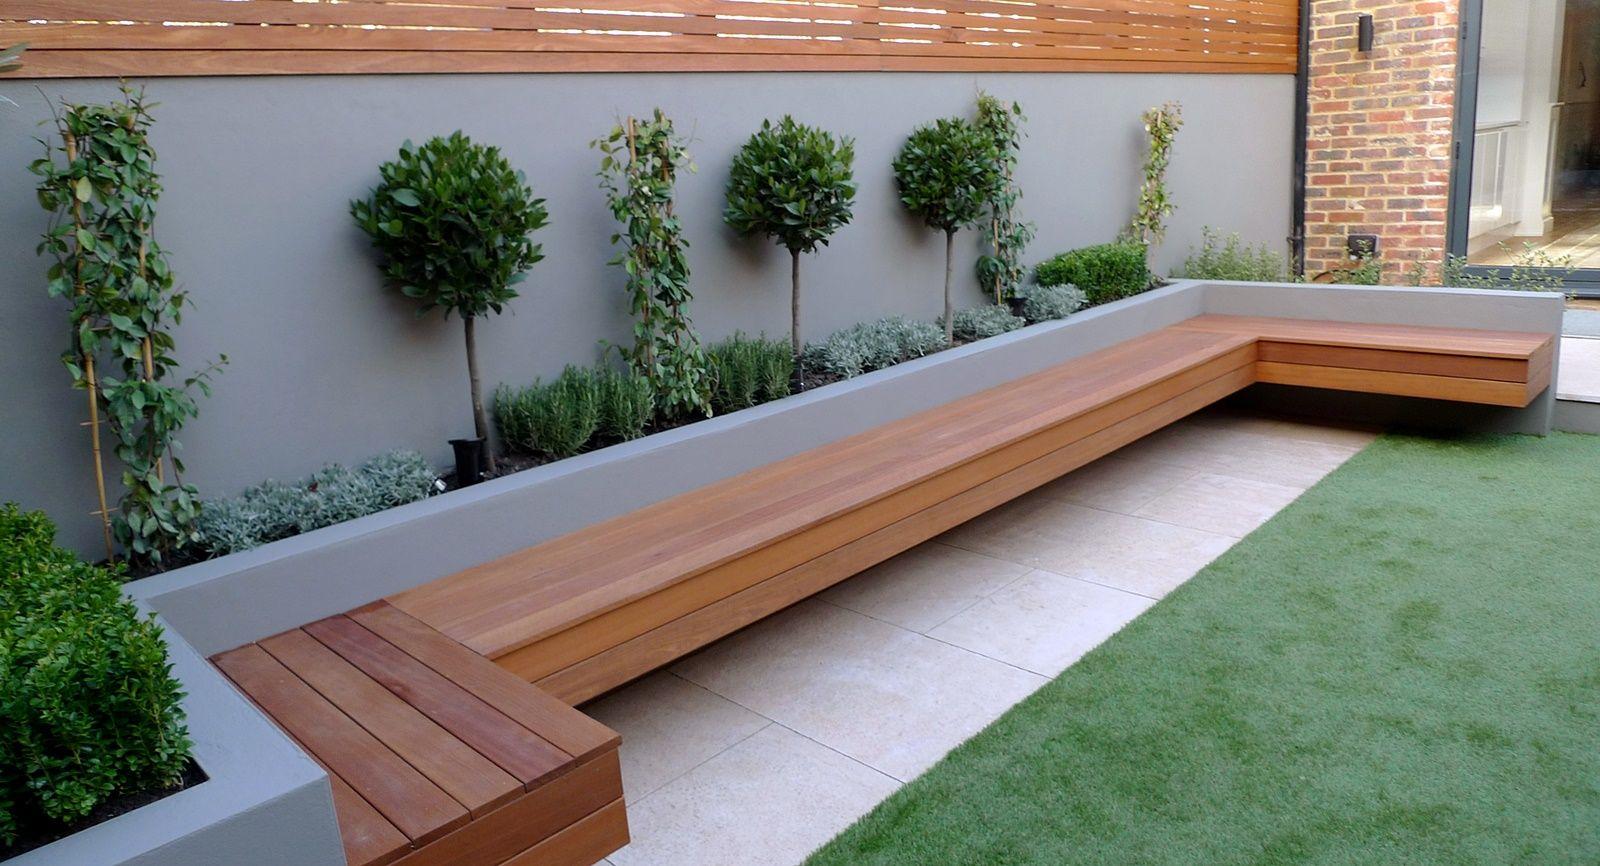 Modern Garden Designer London Artificial Grass Hardwood Seat Fireplace  Hardwood Slatted Cedar Screen Trellis Chelsea London